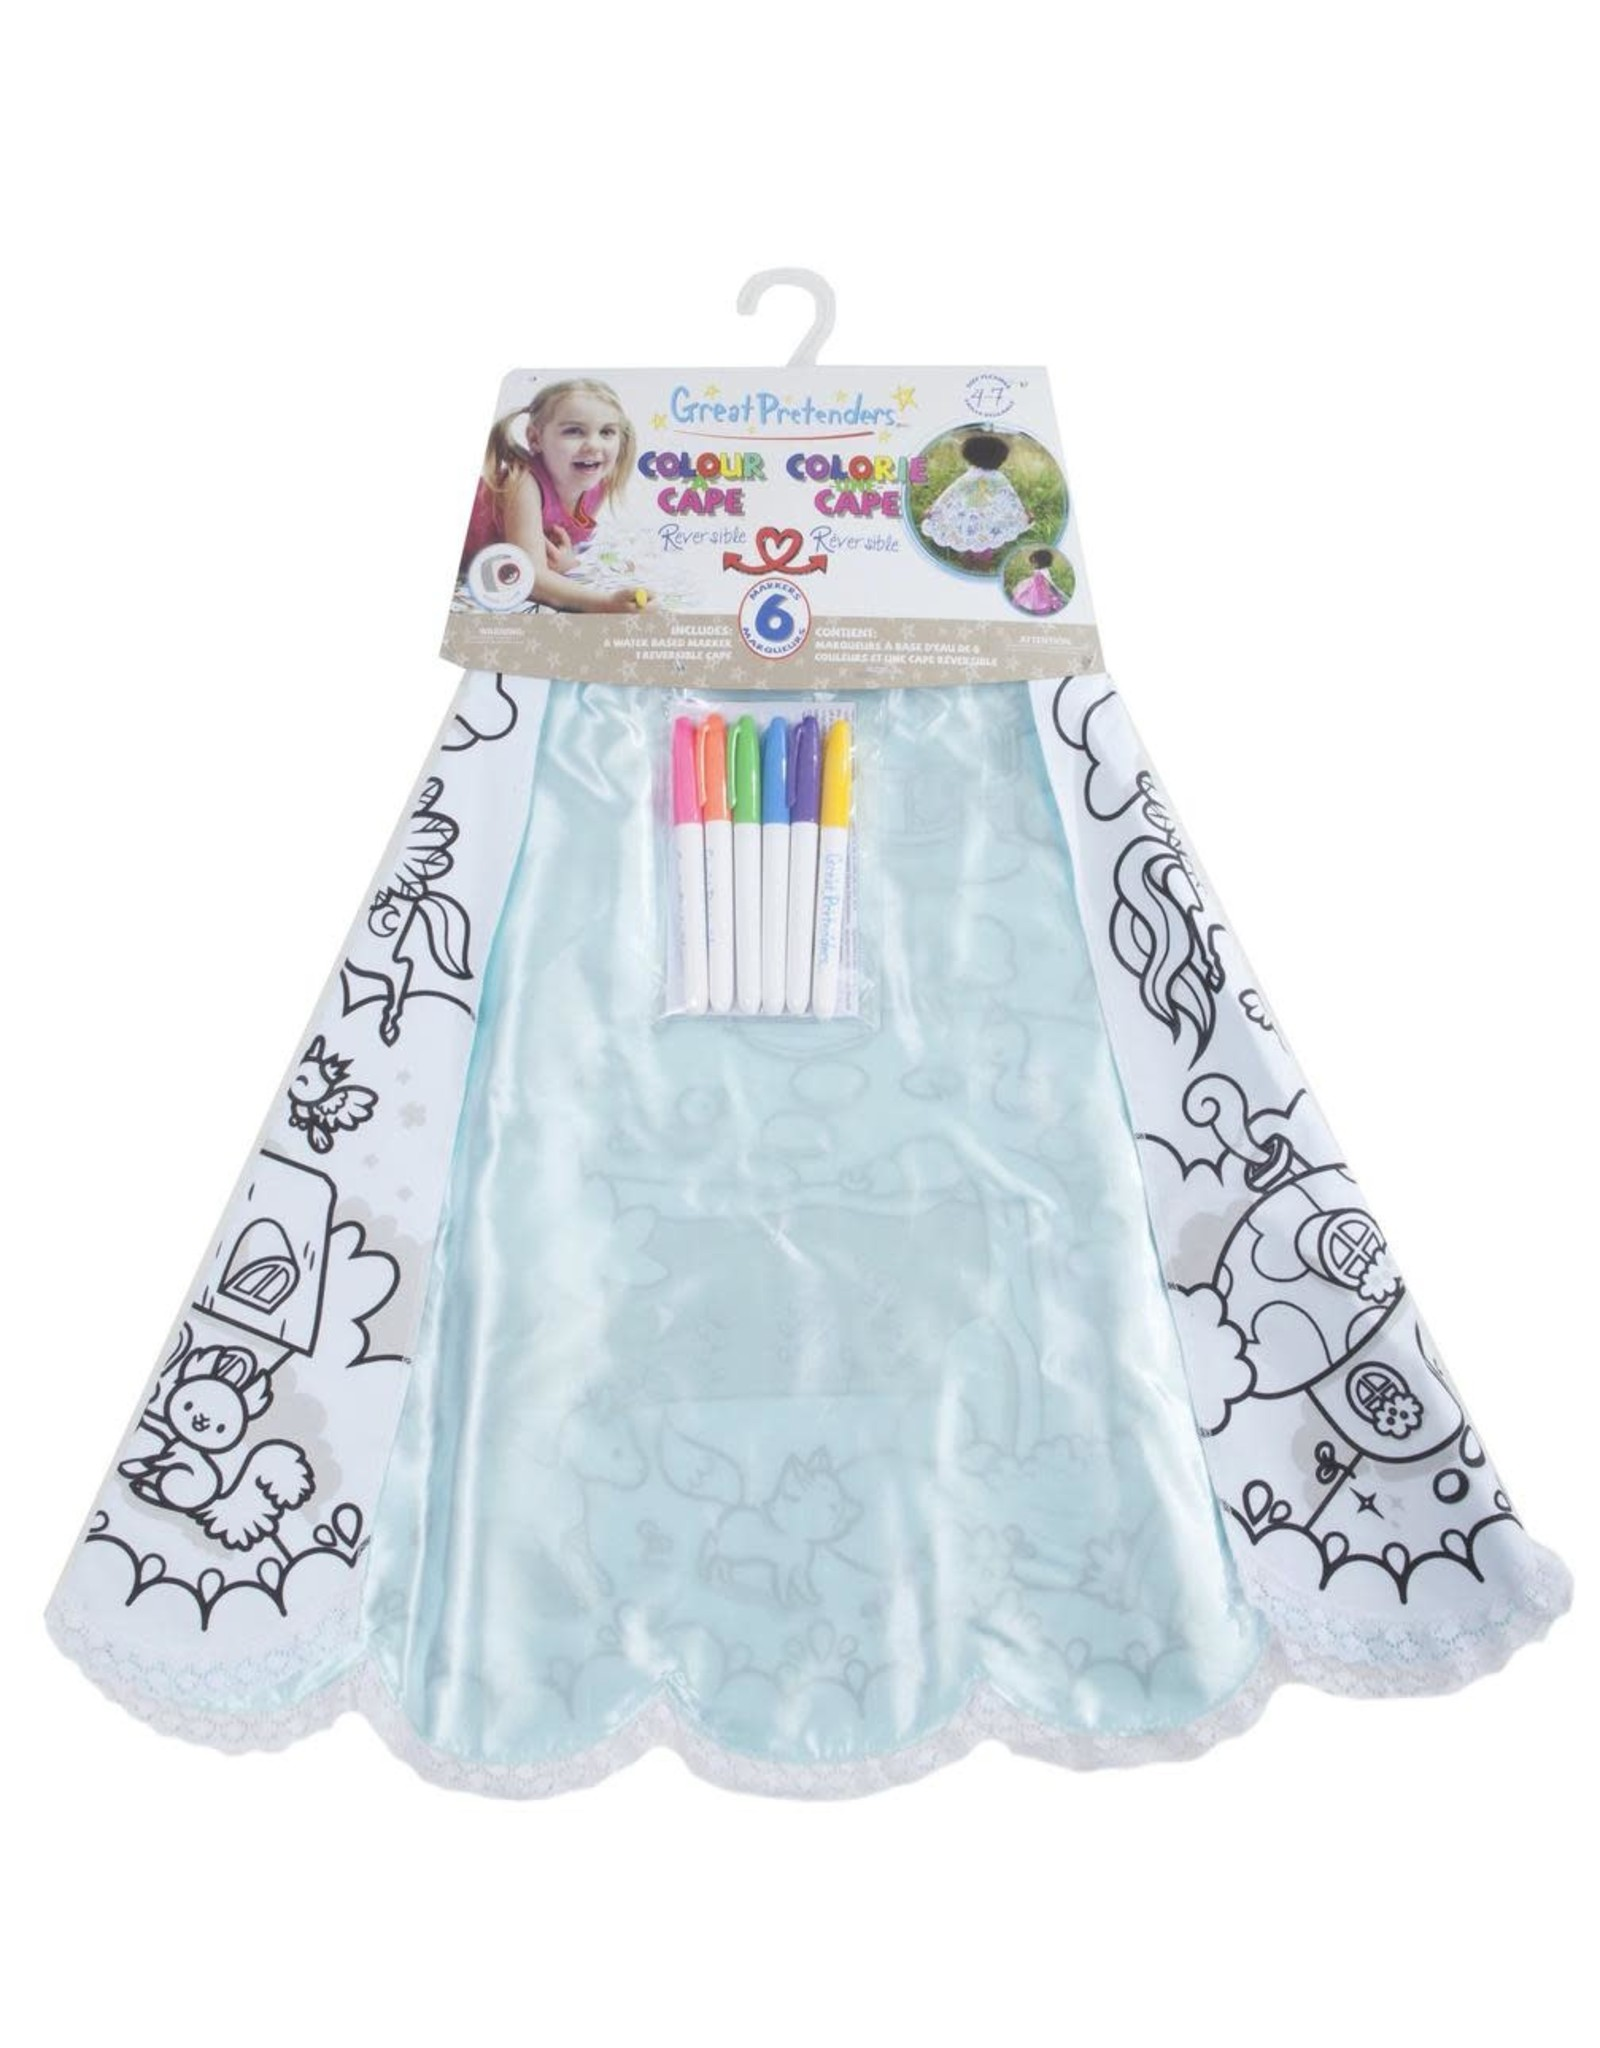 Great Pretenders Colour-A-Cape  Magical Princess  Size 4-7